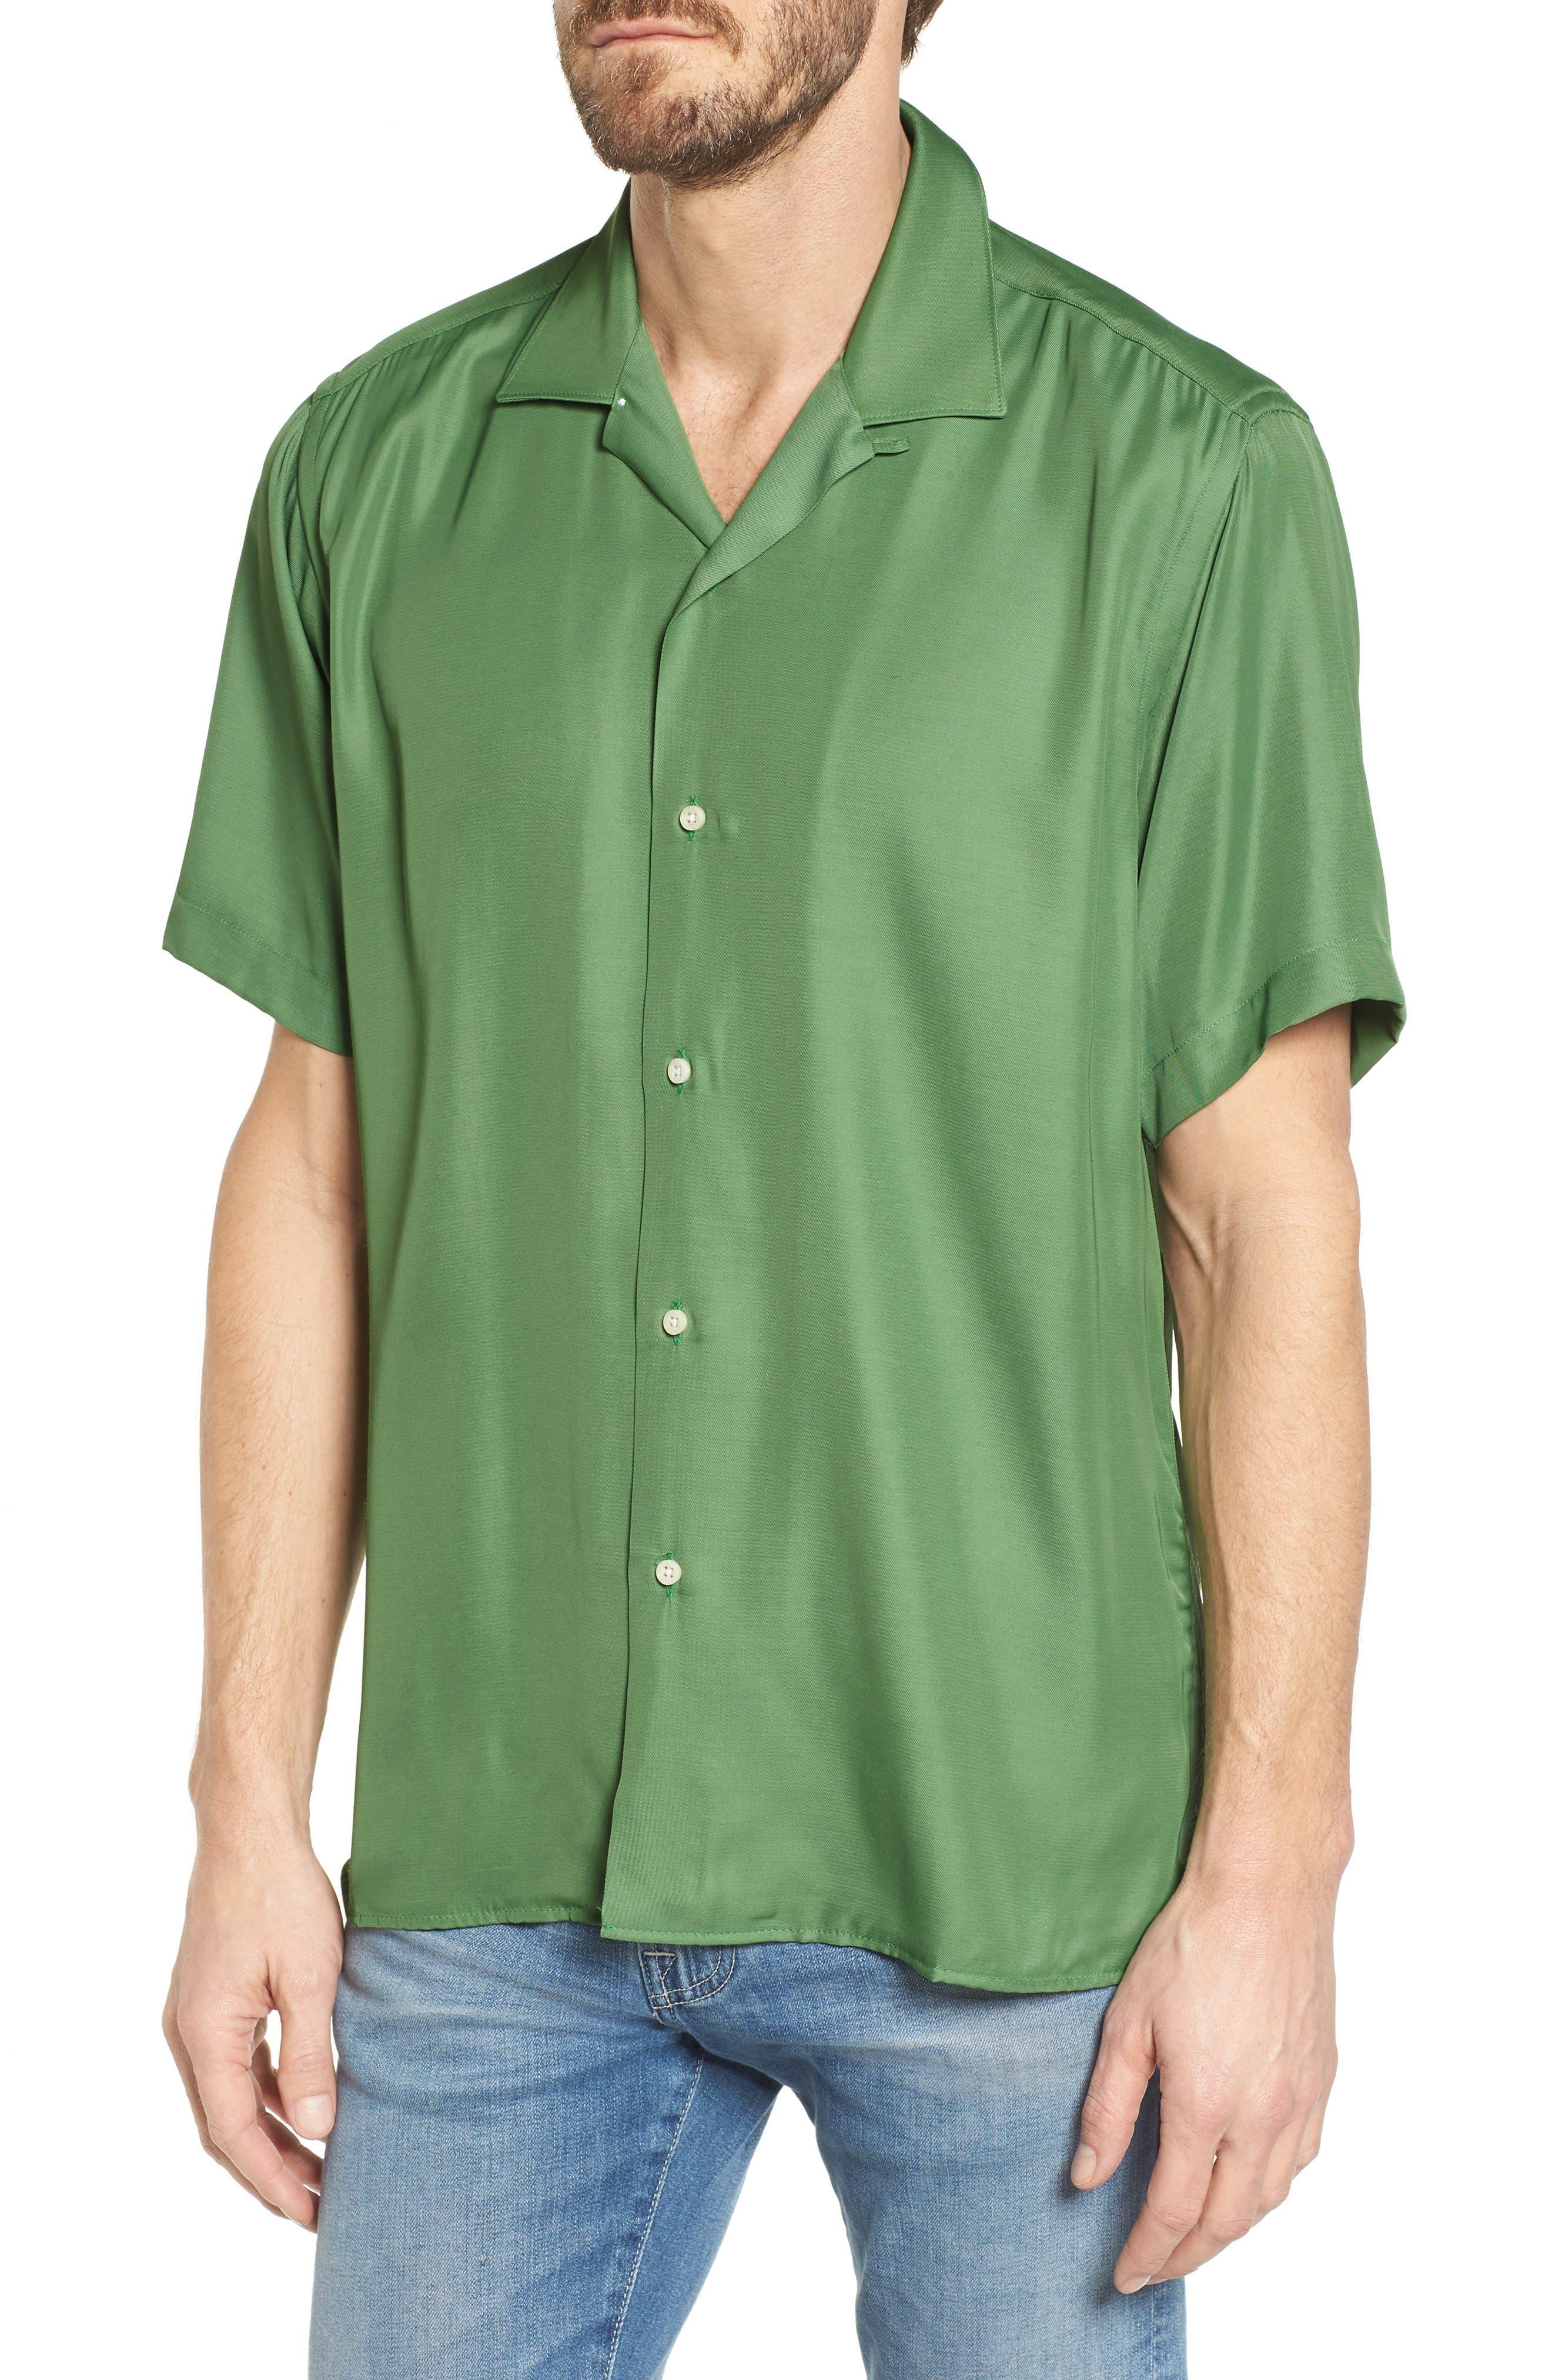 Main Image - Gitman Camp Shirt